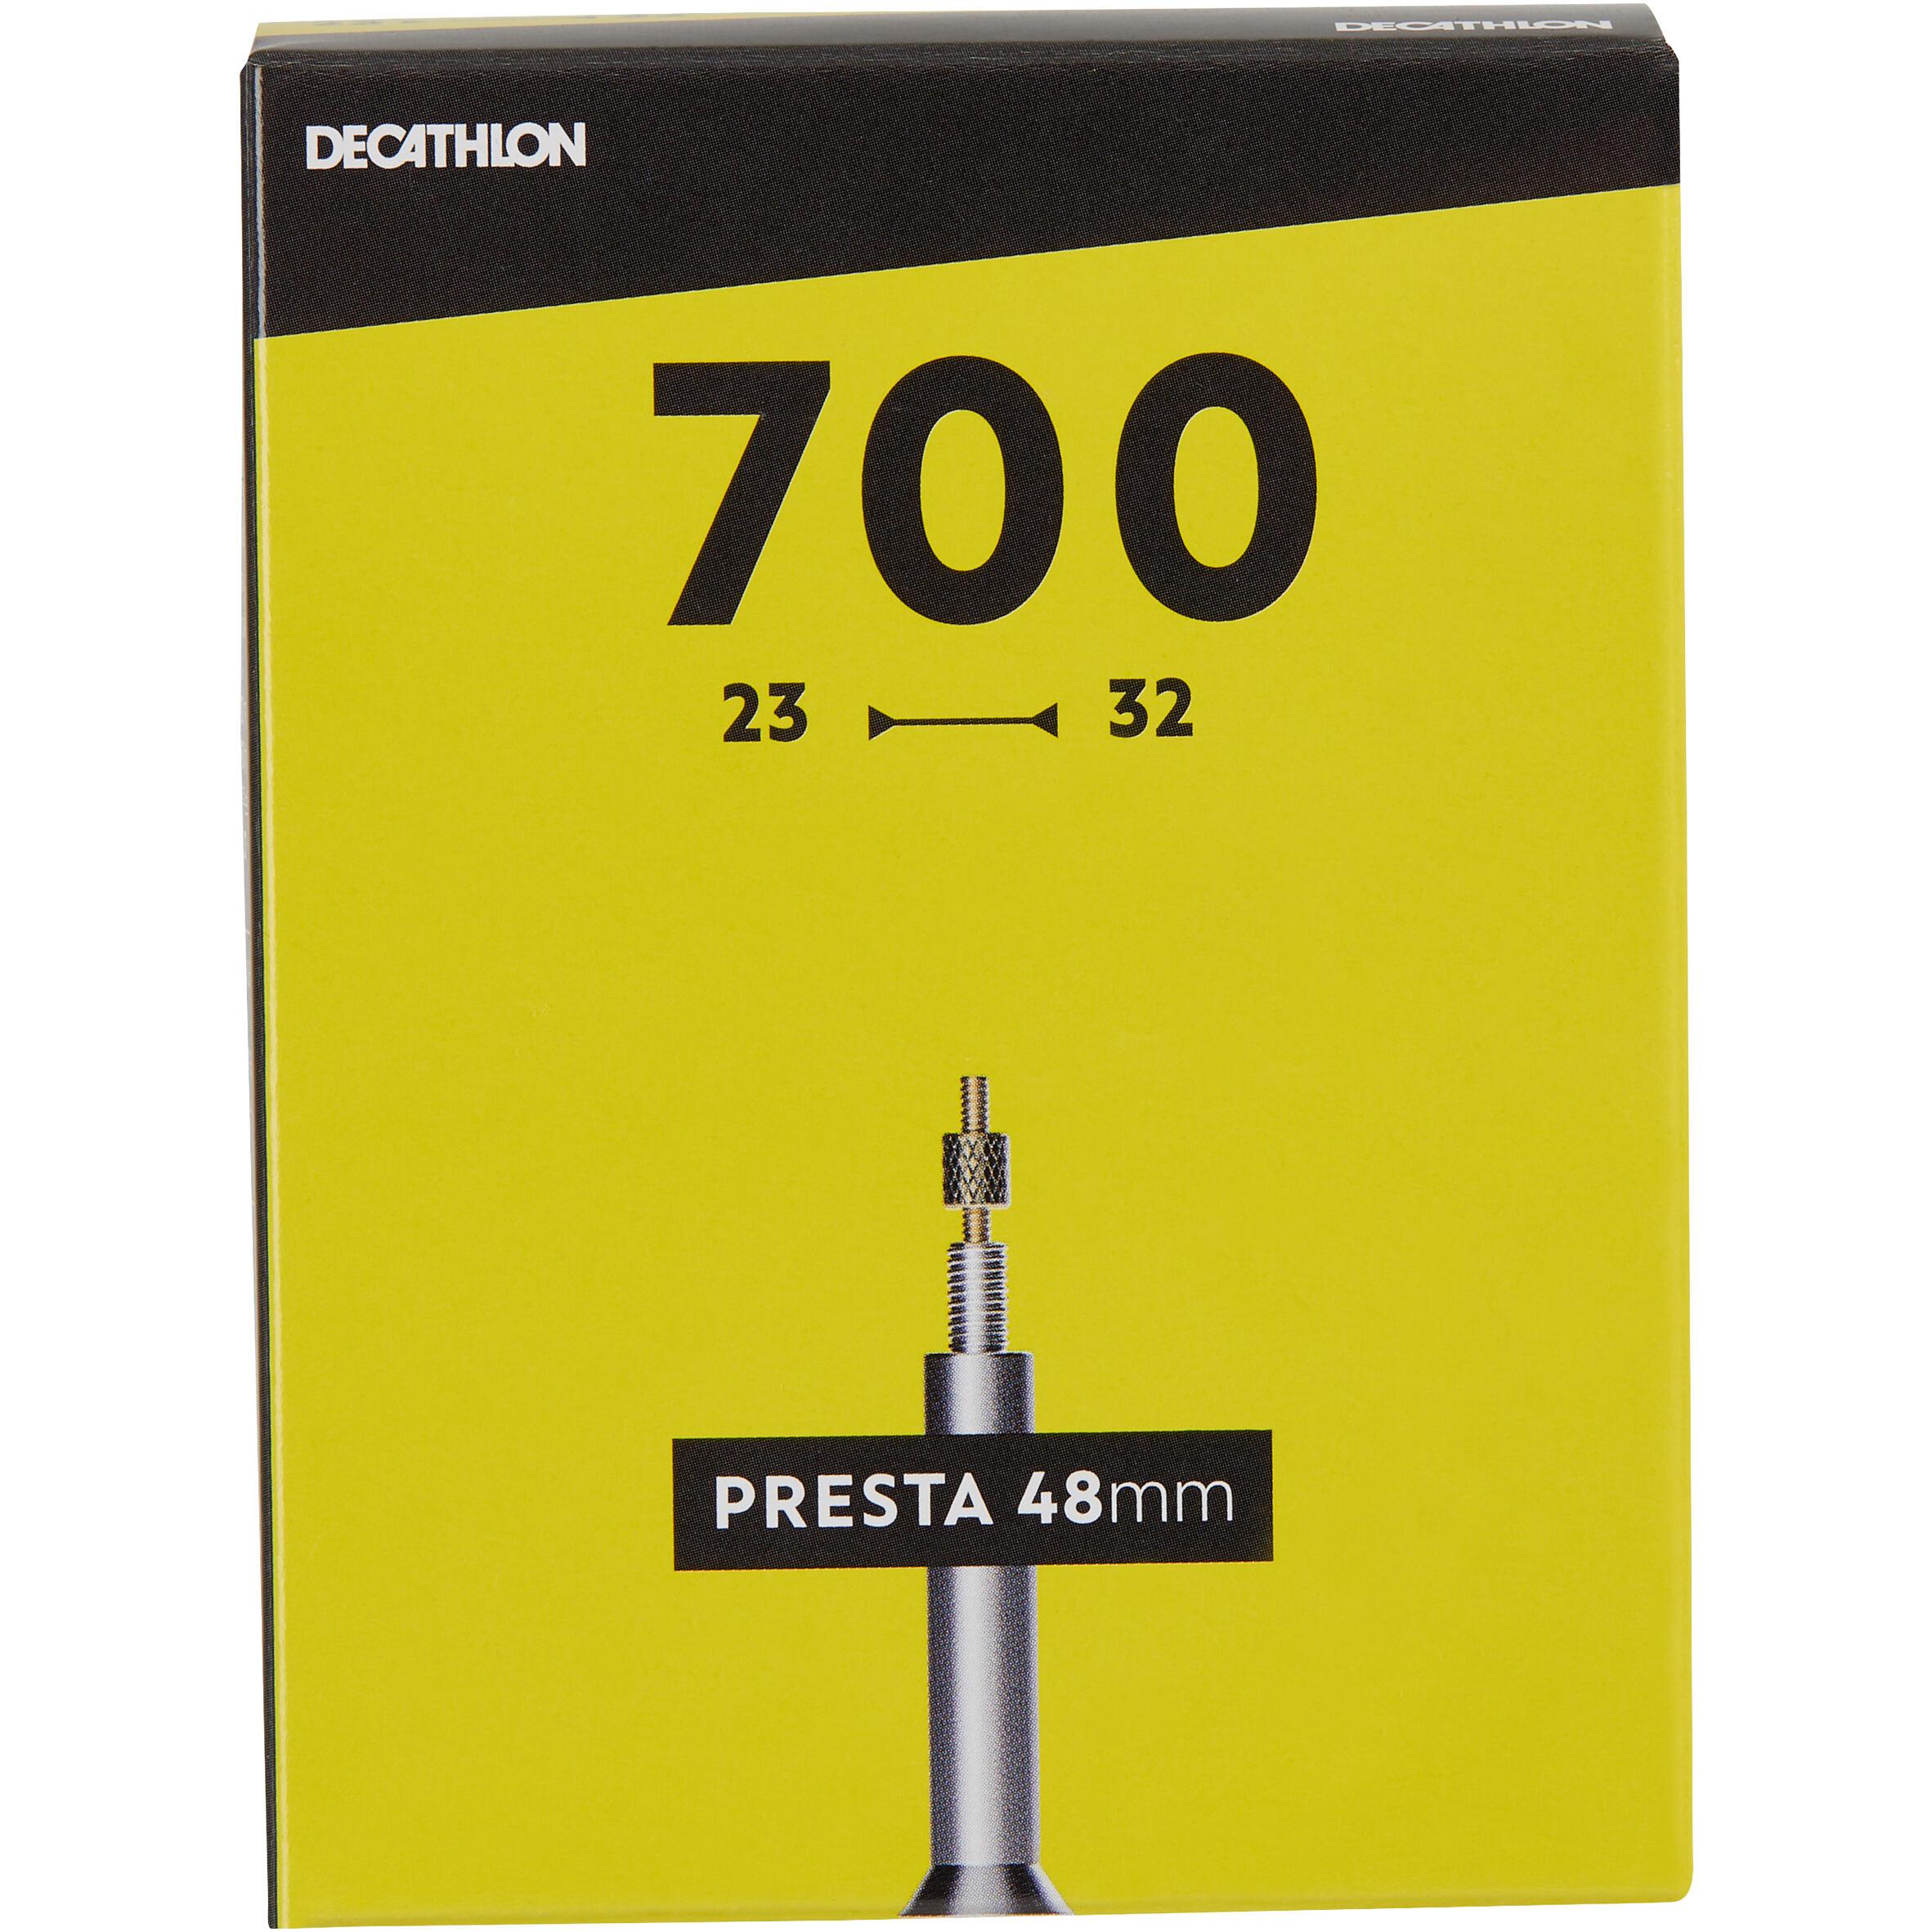 B 39 twin binnenband 700x23 32 prestaventiel 48 mm - Chambre a air velo route 700x23 ...